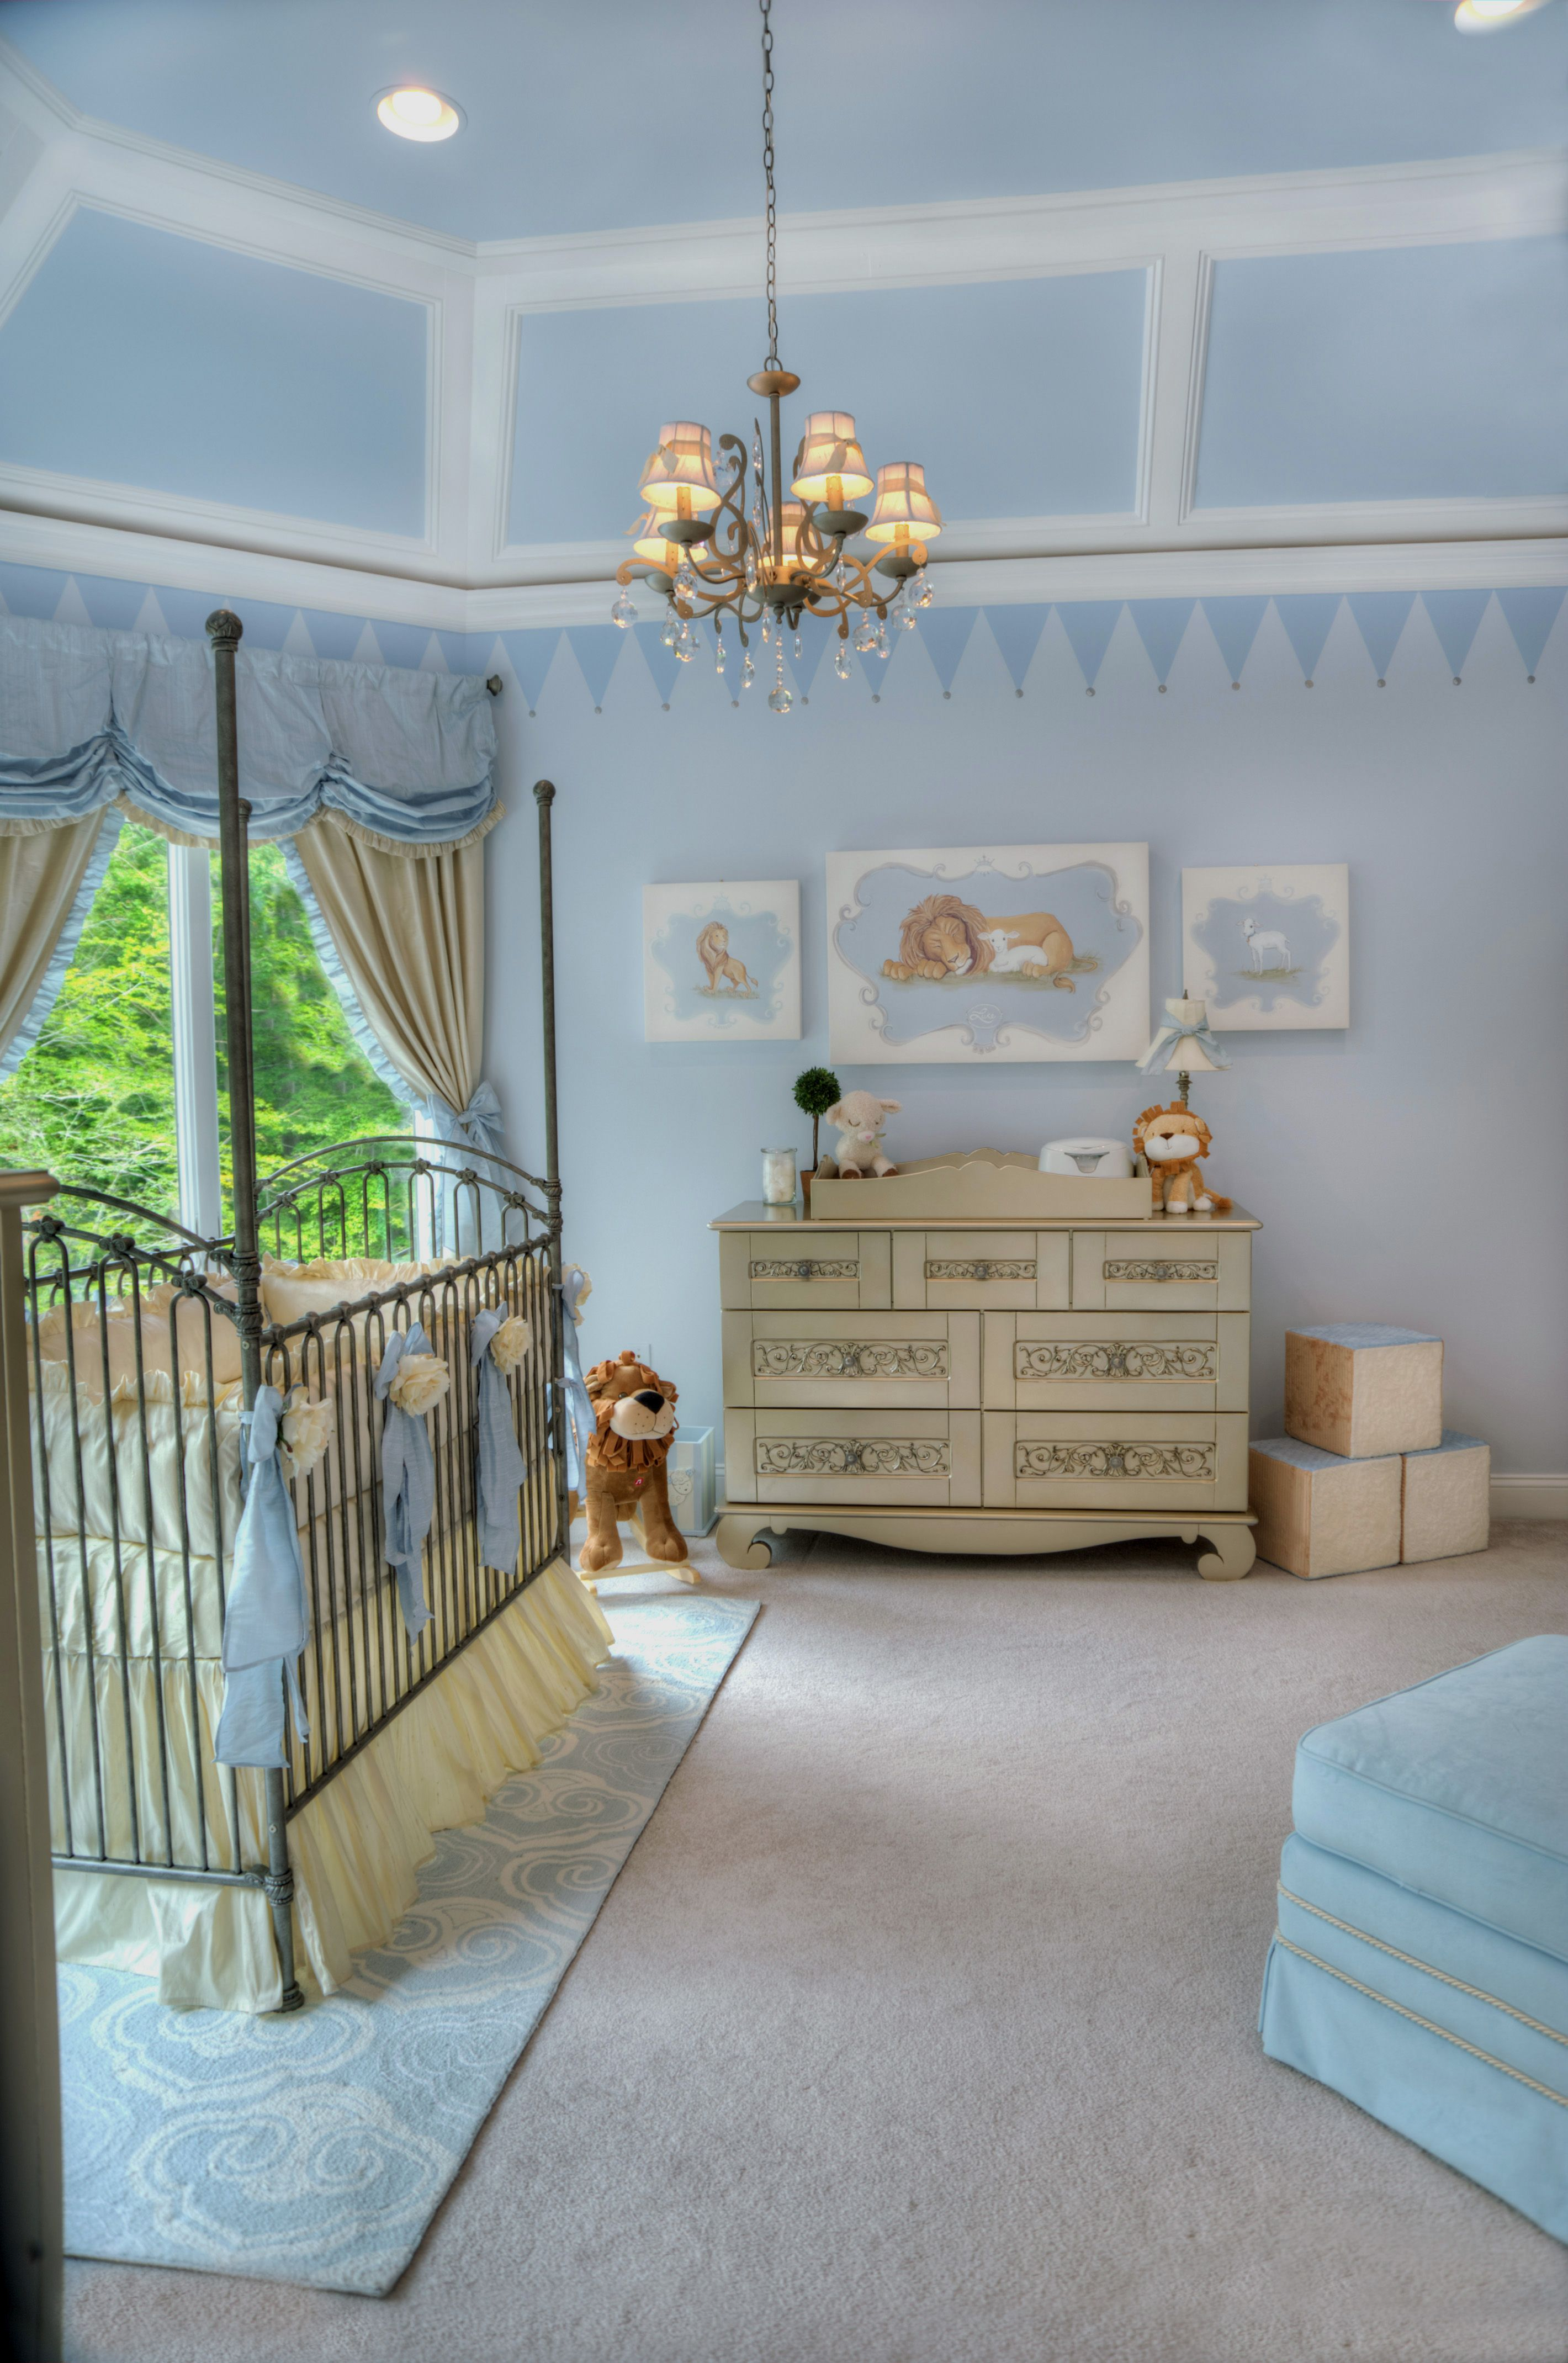 royal prince nursery prince baby nursery design ideas fairytale room by celebrity nursery designer - Baby Boy Room Rugs